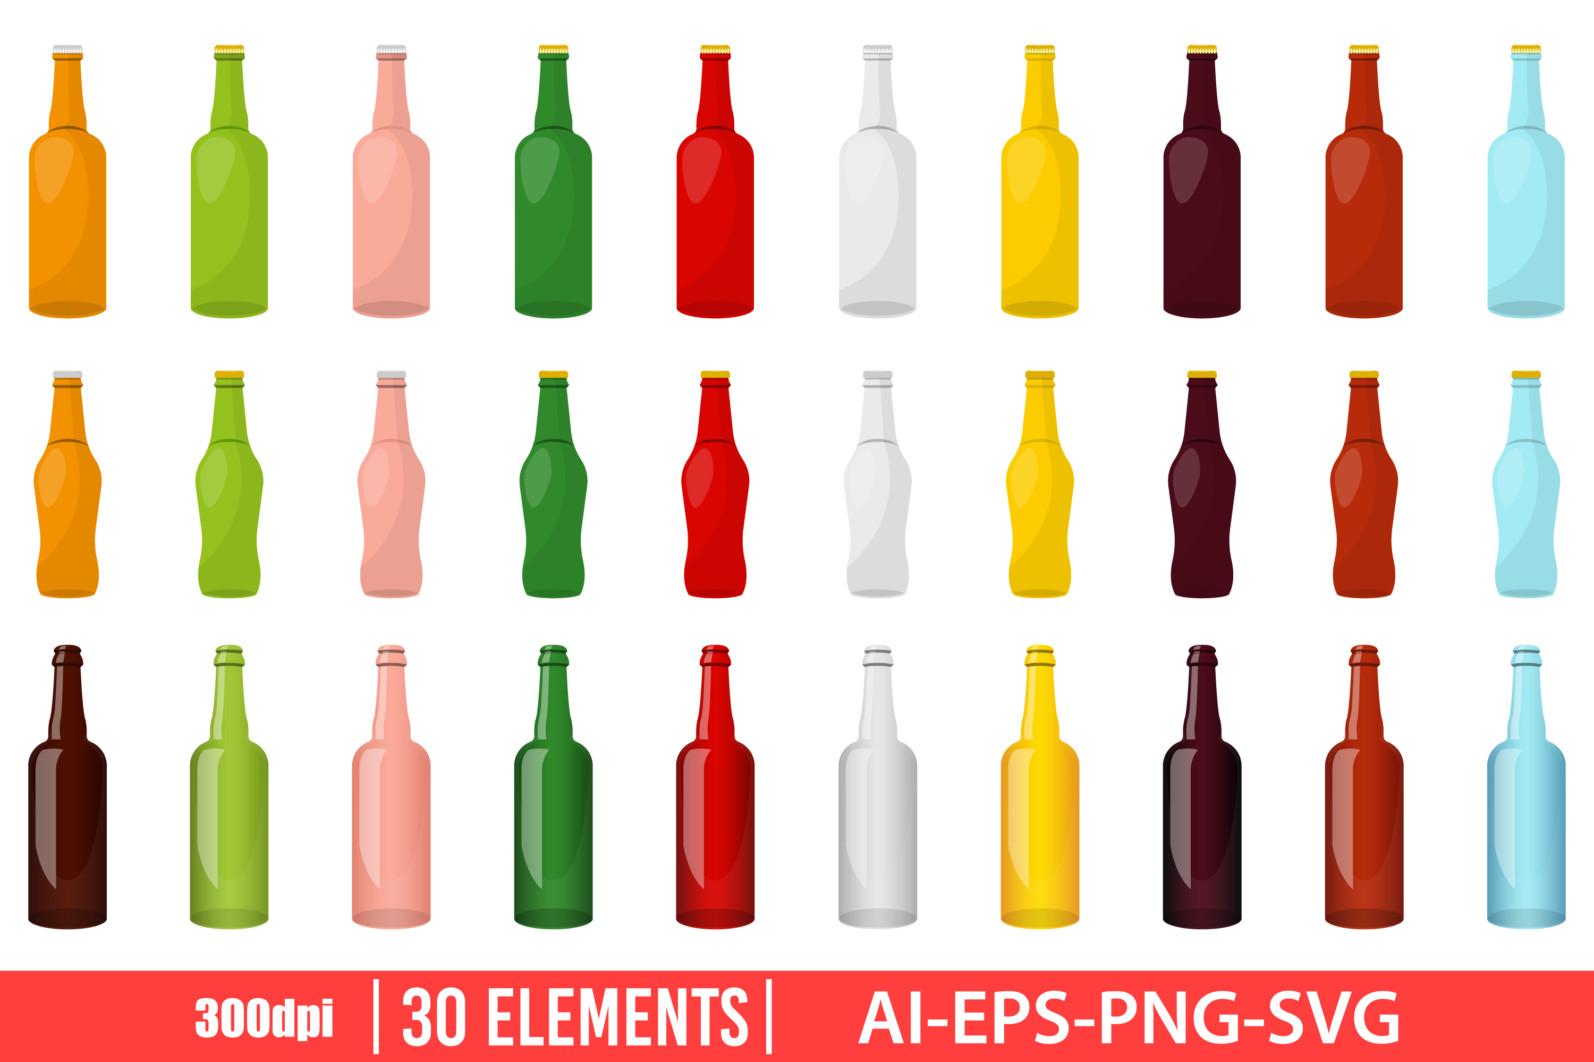 Glass bottle clipart vector design illustration. Glass bottle set. Vector Clipart Print - GLASS BOTTLE scaled -